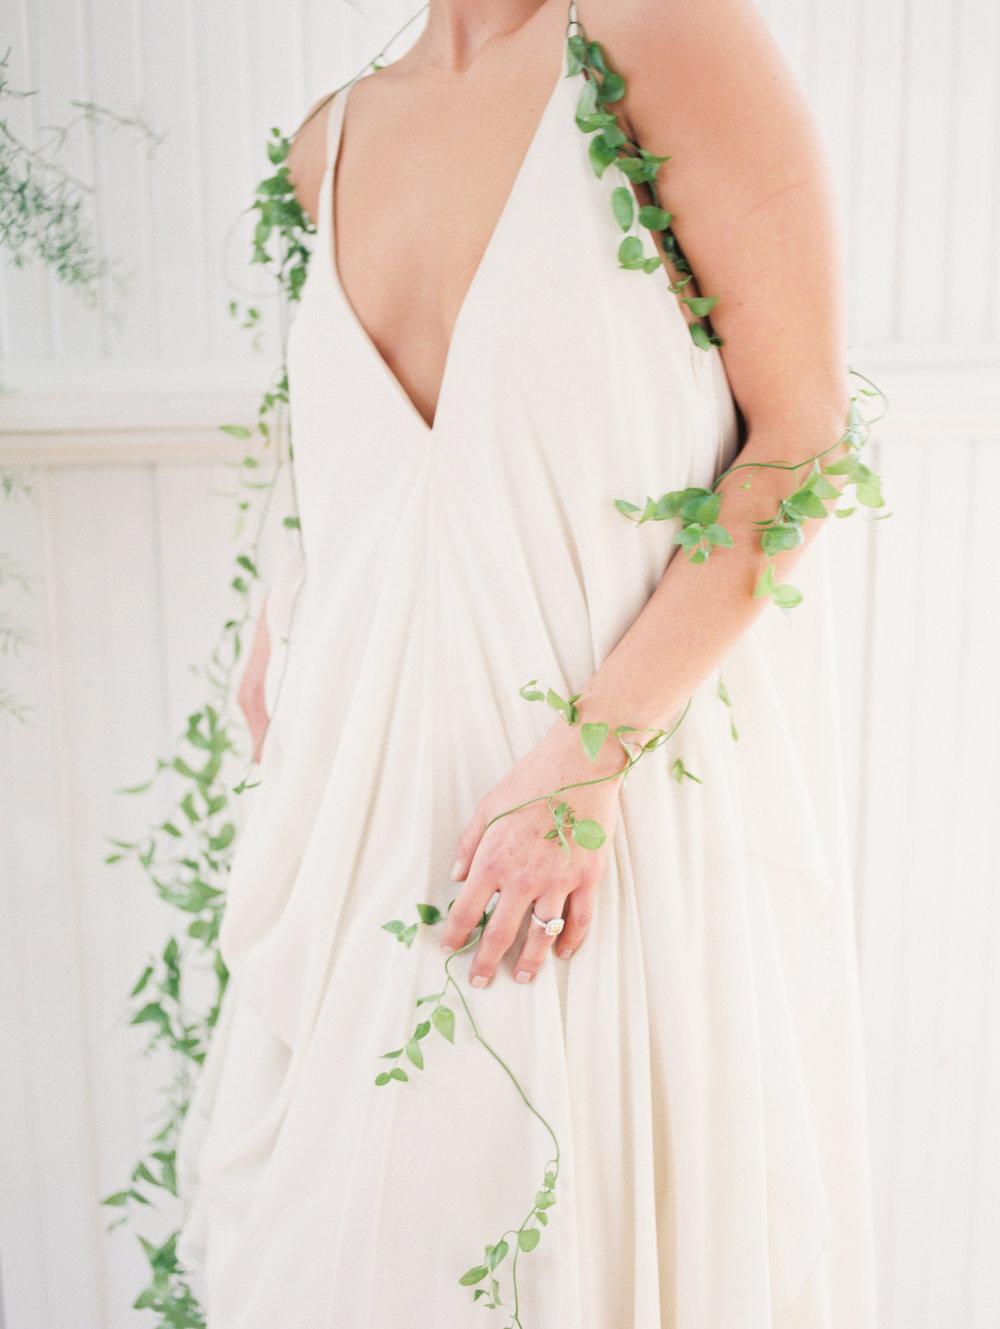 unique bridal portrait with greenery vines.jpg